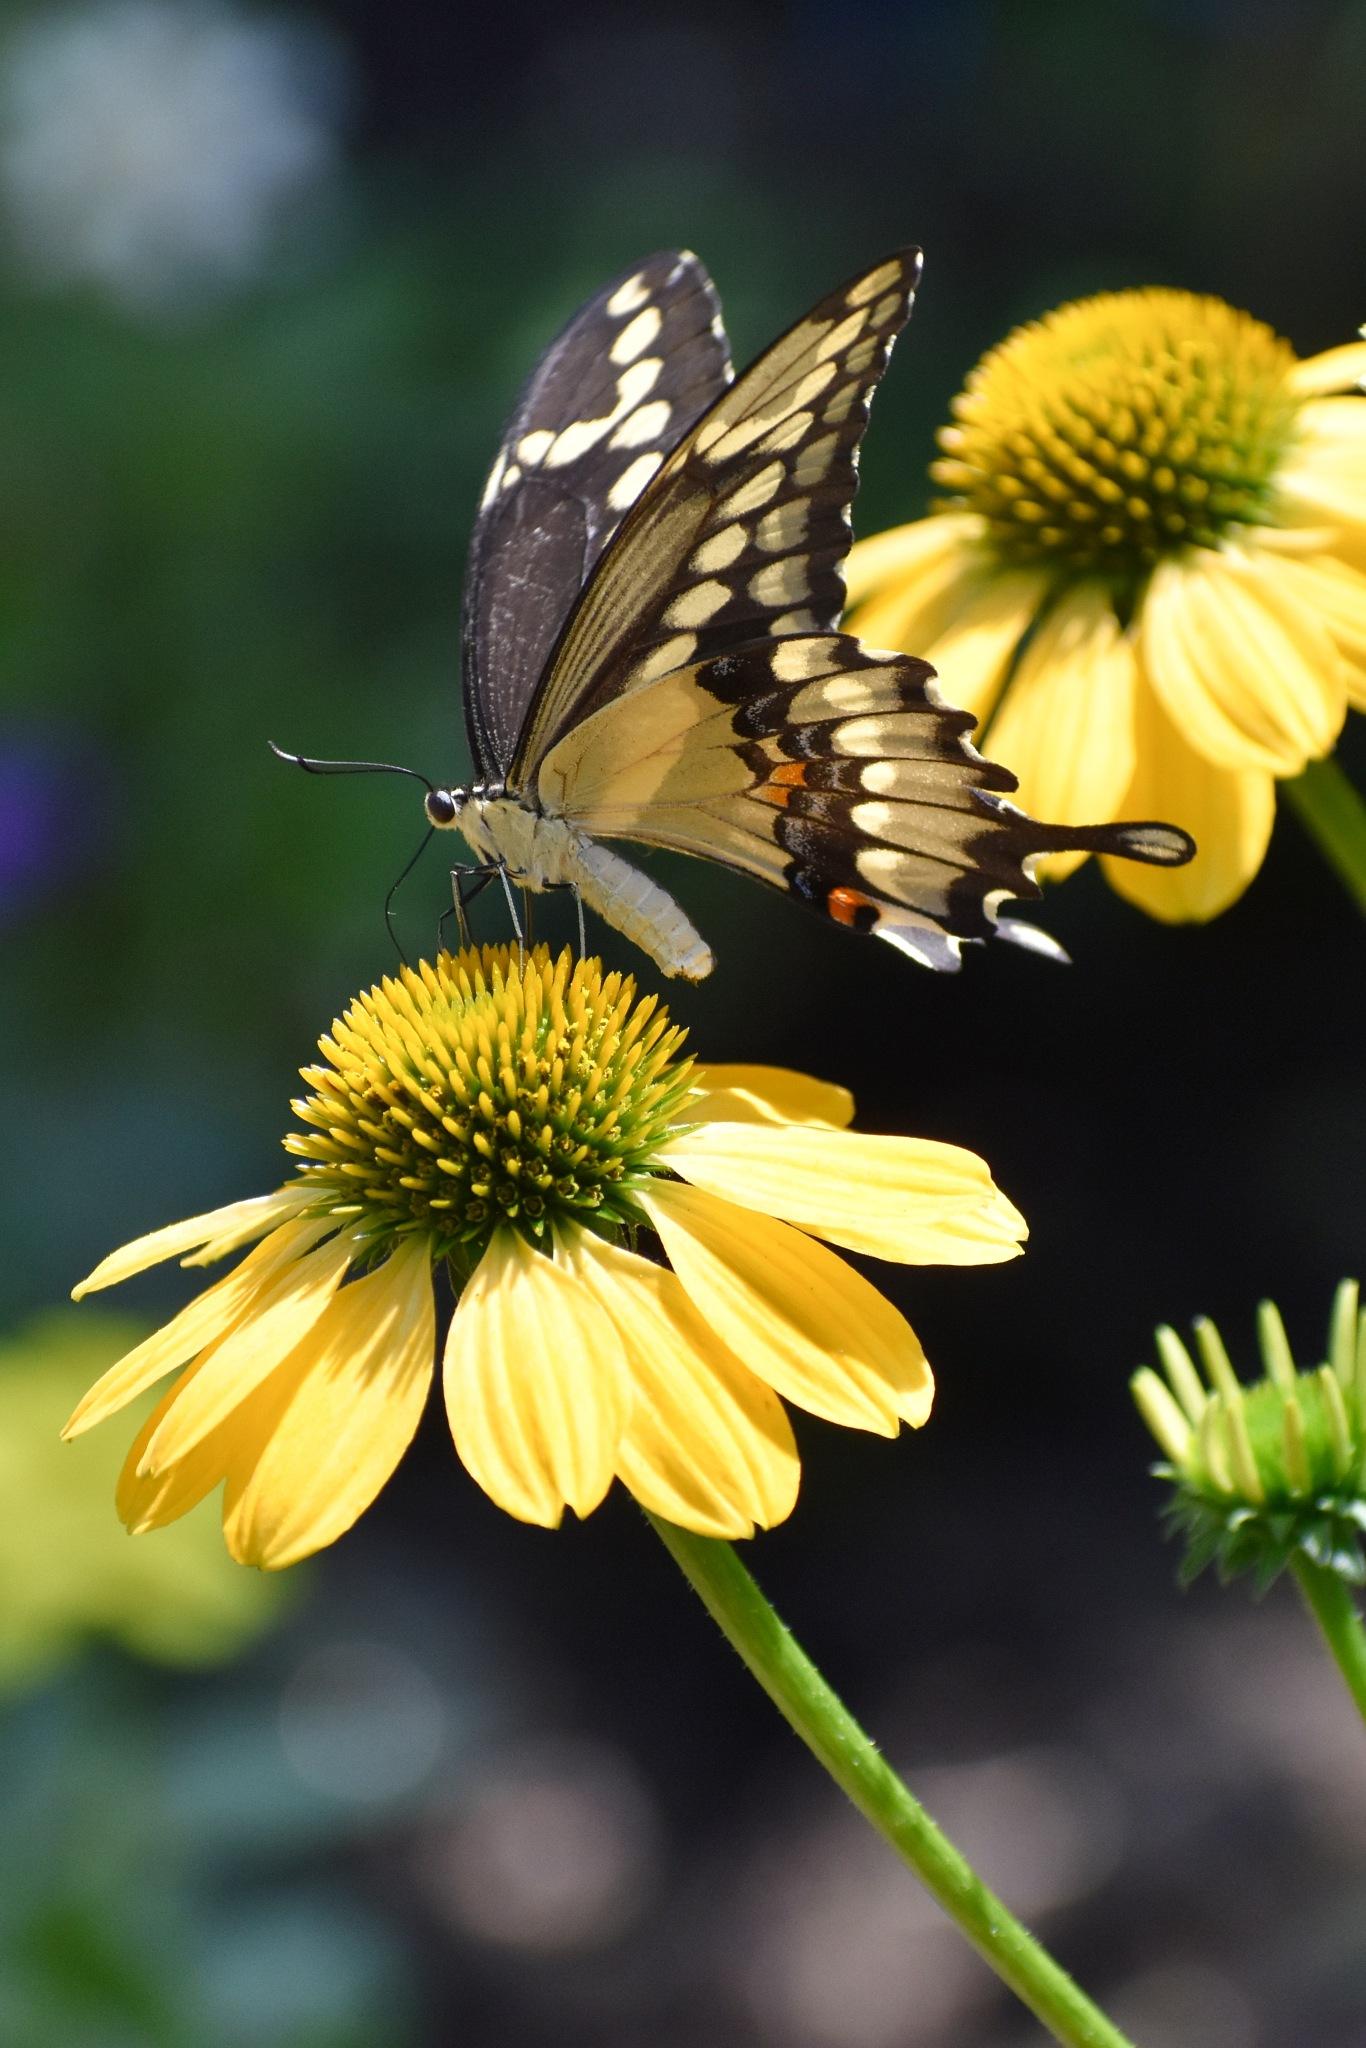 The Butterfly by Renee Kennedy